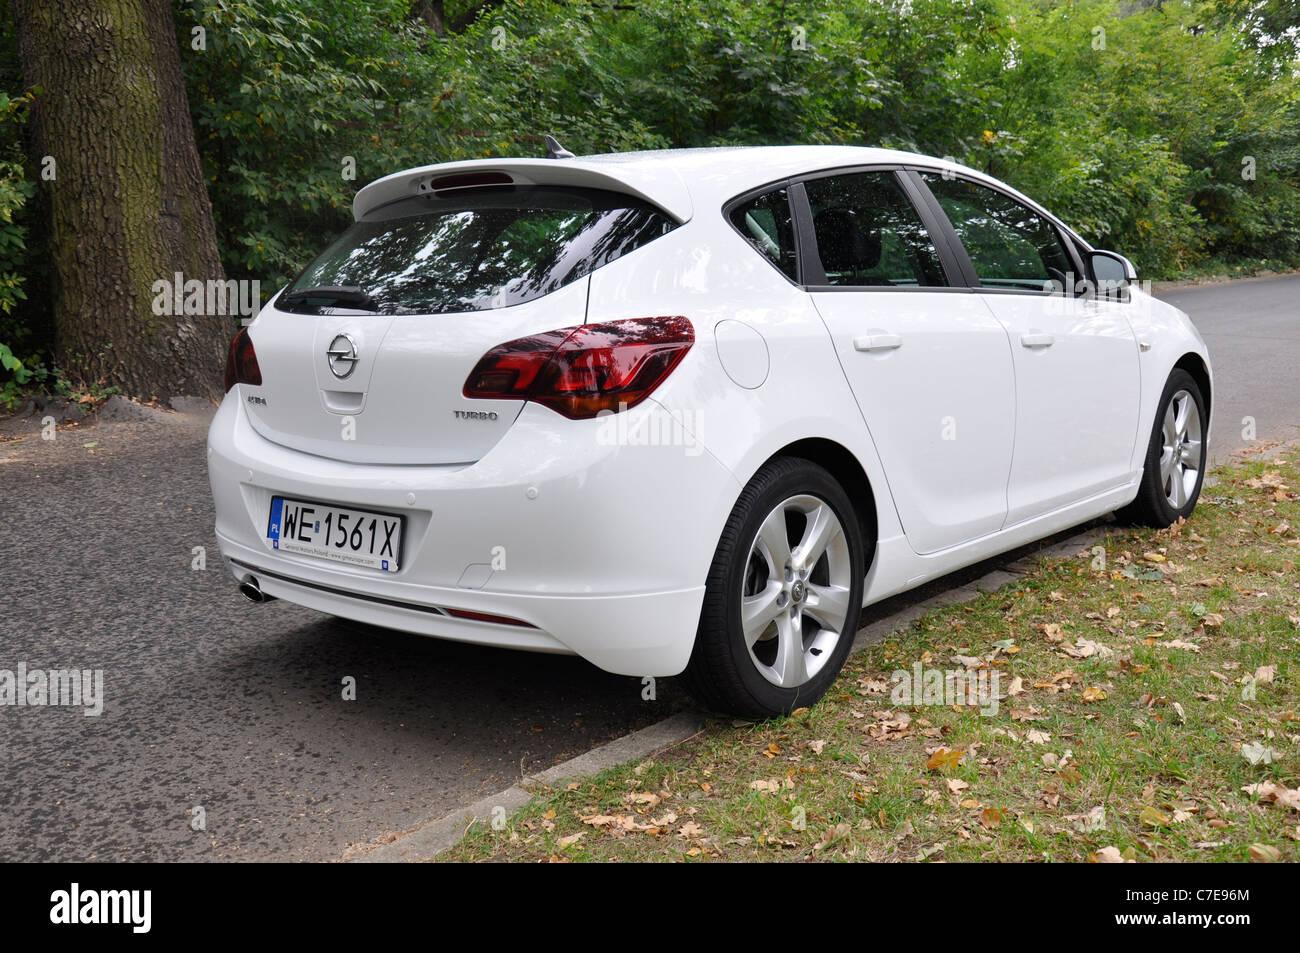 Opel Astra Iv 1 4 Turbo My 2009 White German Compact Car Stock Photo Alamy